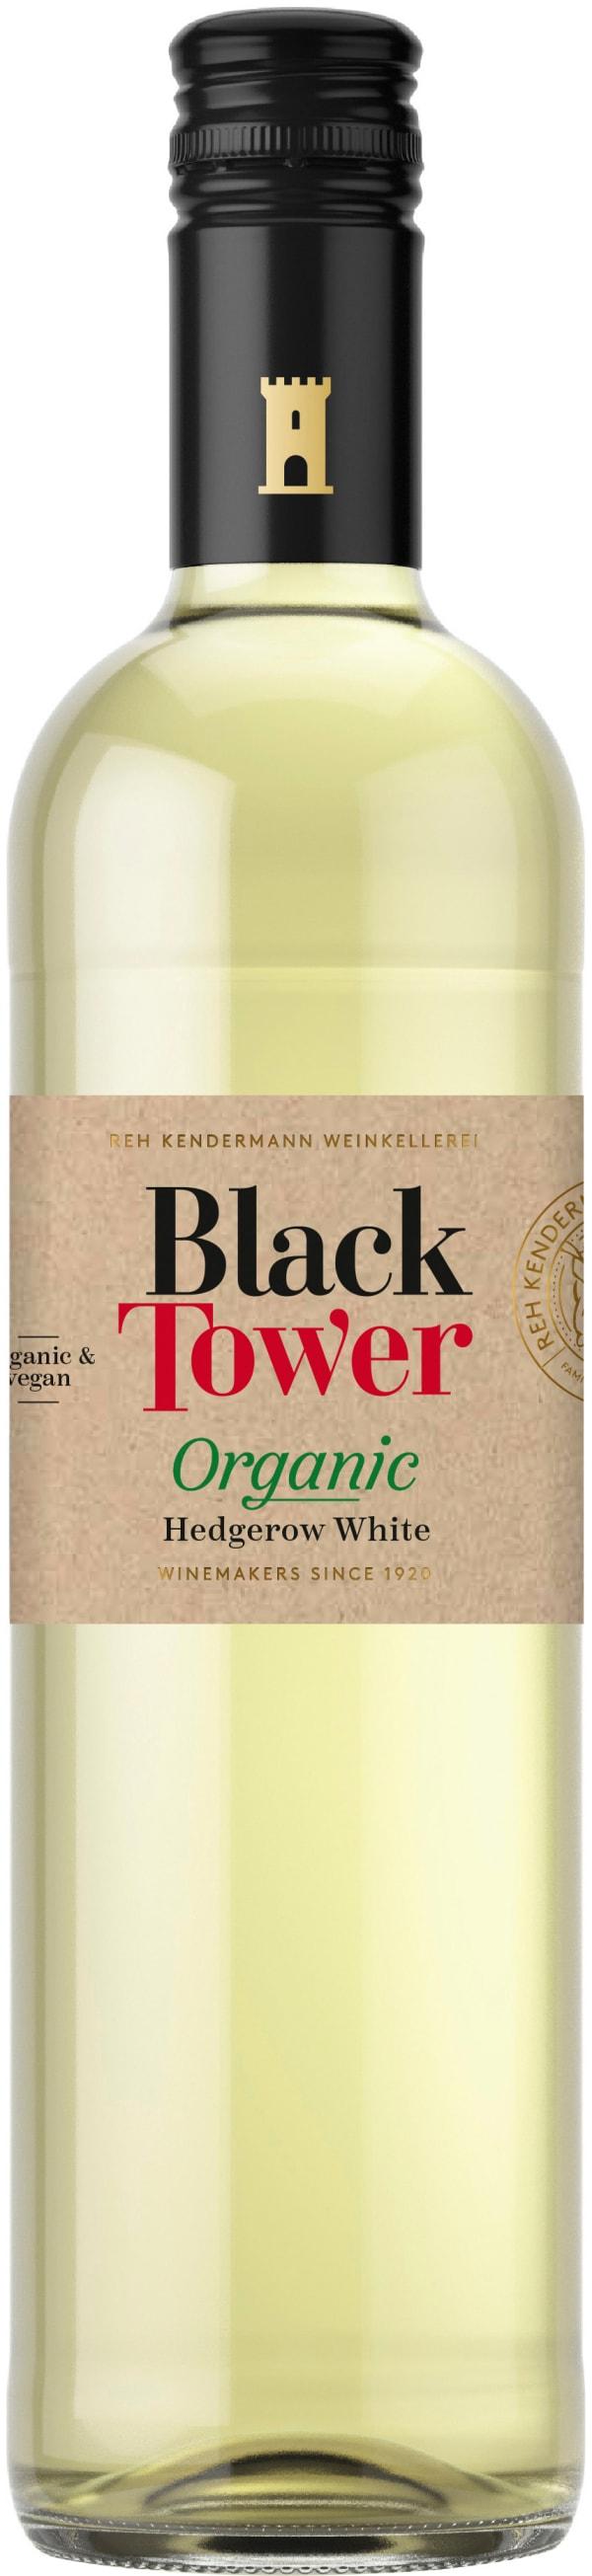 Black Tower Hedgerow Organic 2017